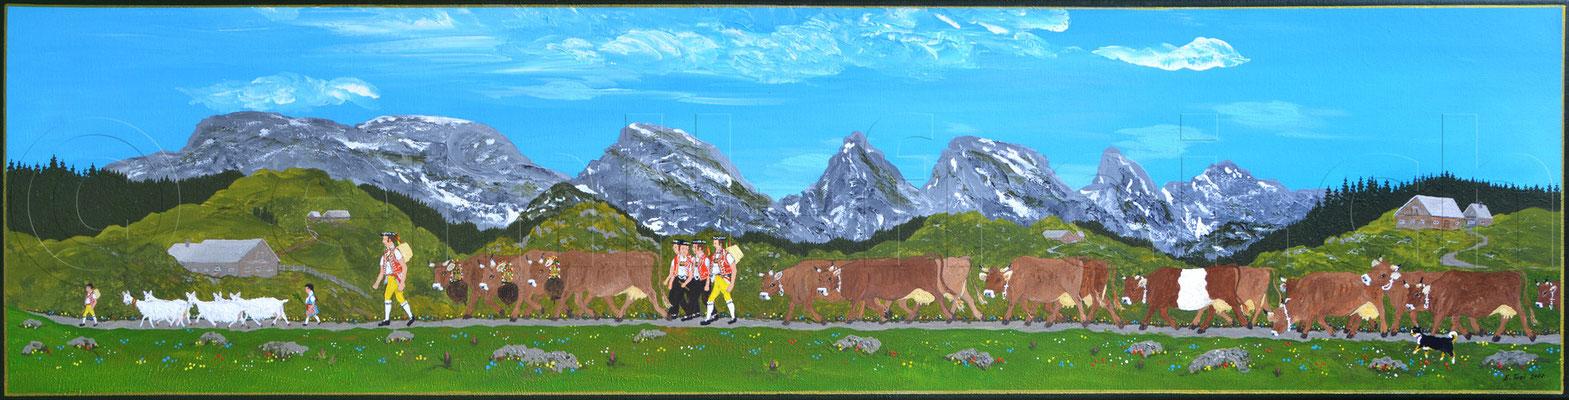 30 x 120 cm, Acryl auf Leinwand, 2011